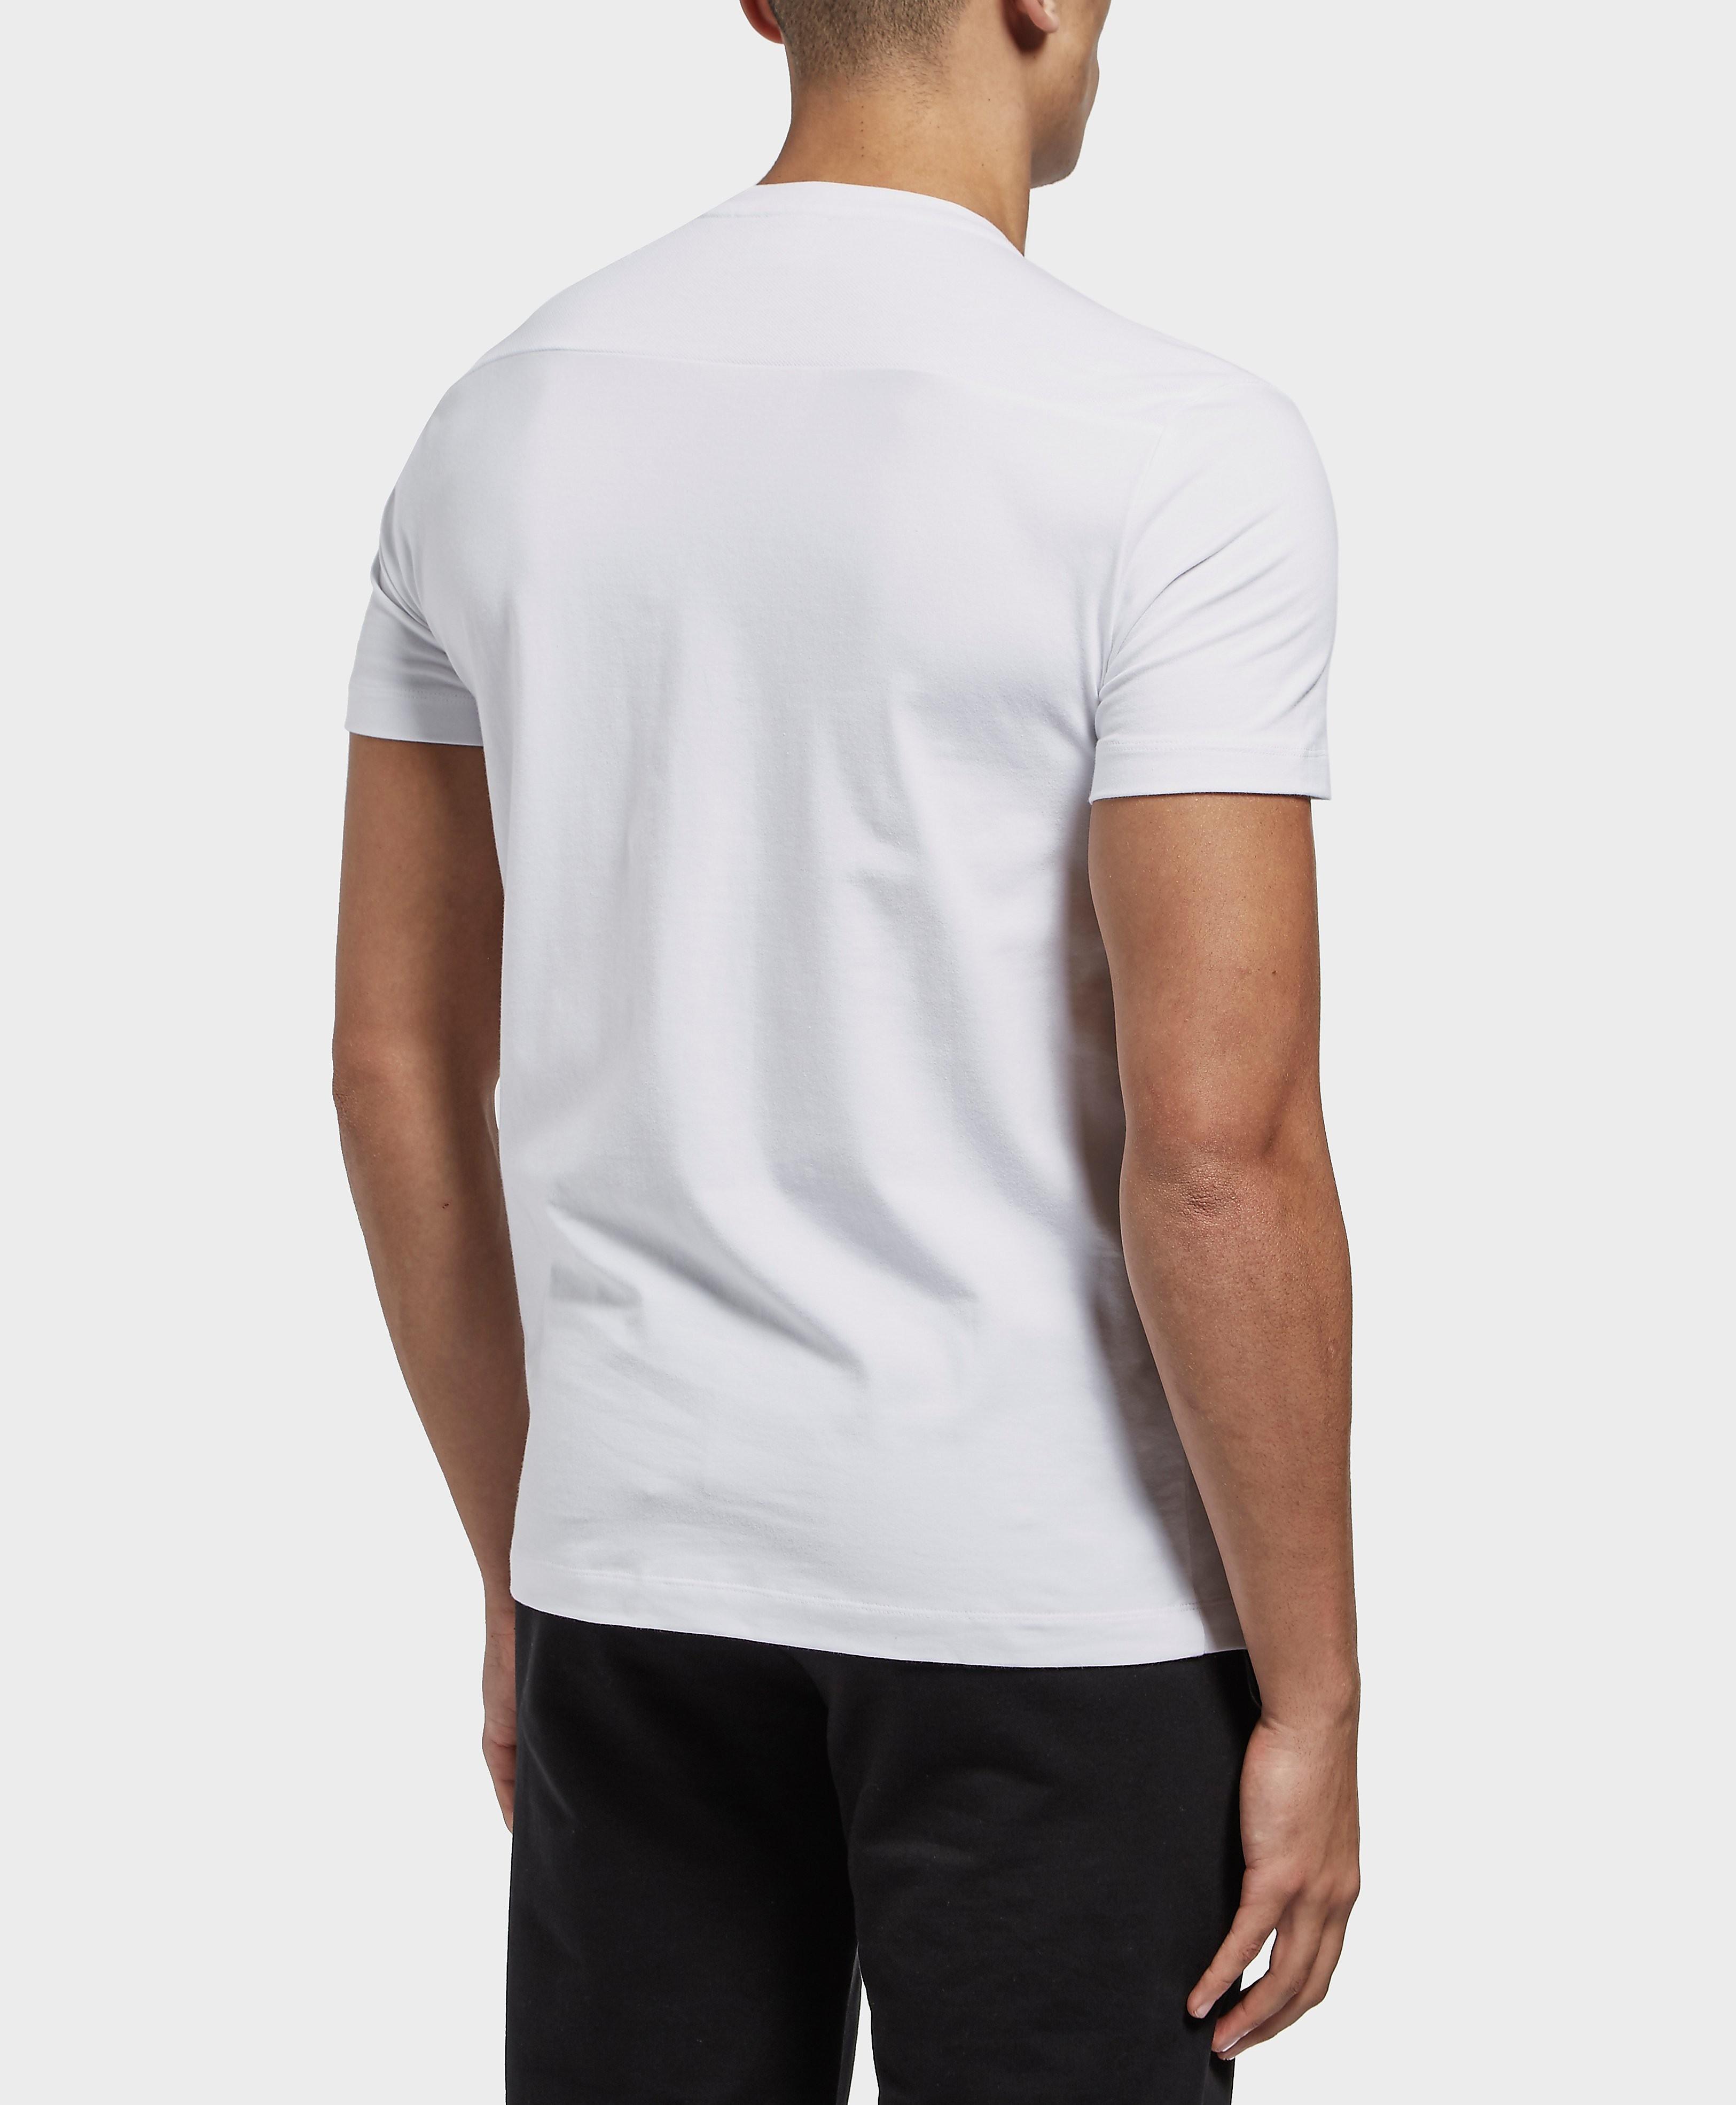 Emporio Armani EA7 Evo Short Sleeve T-Shirt